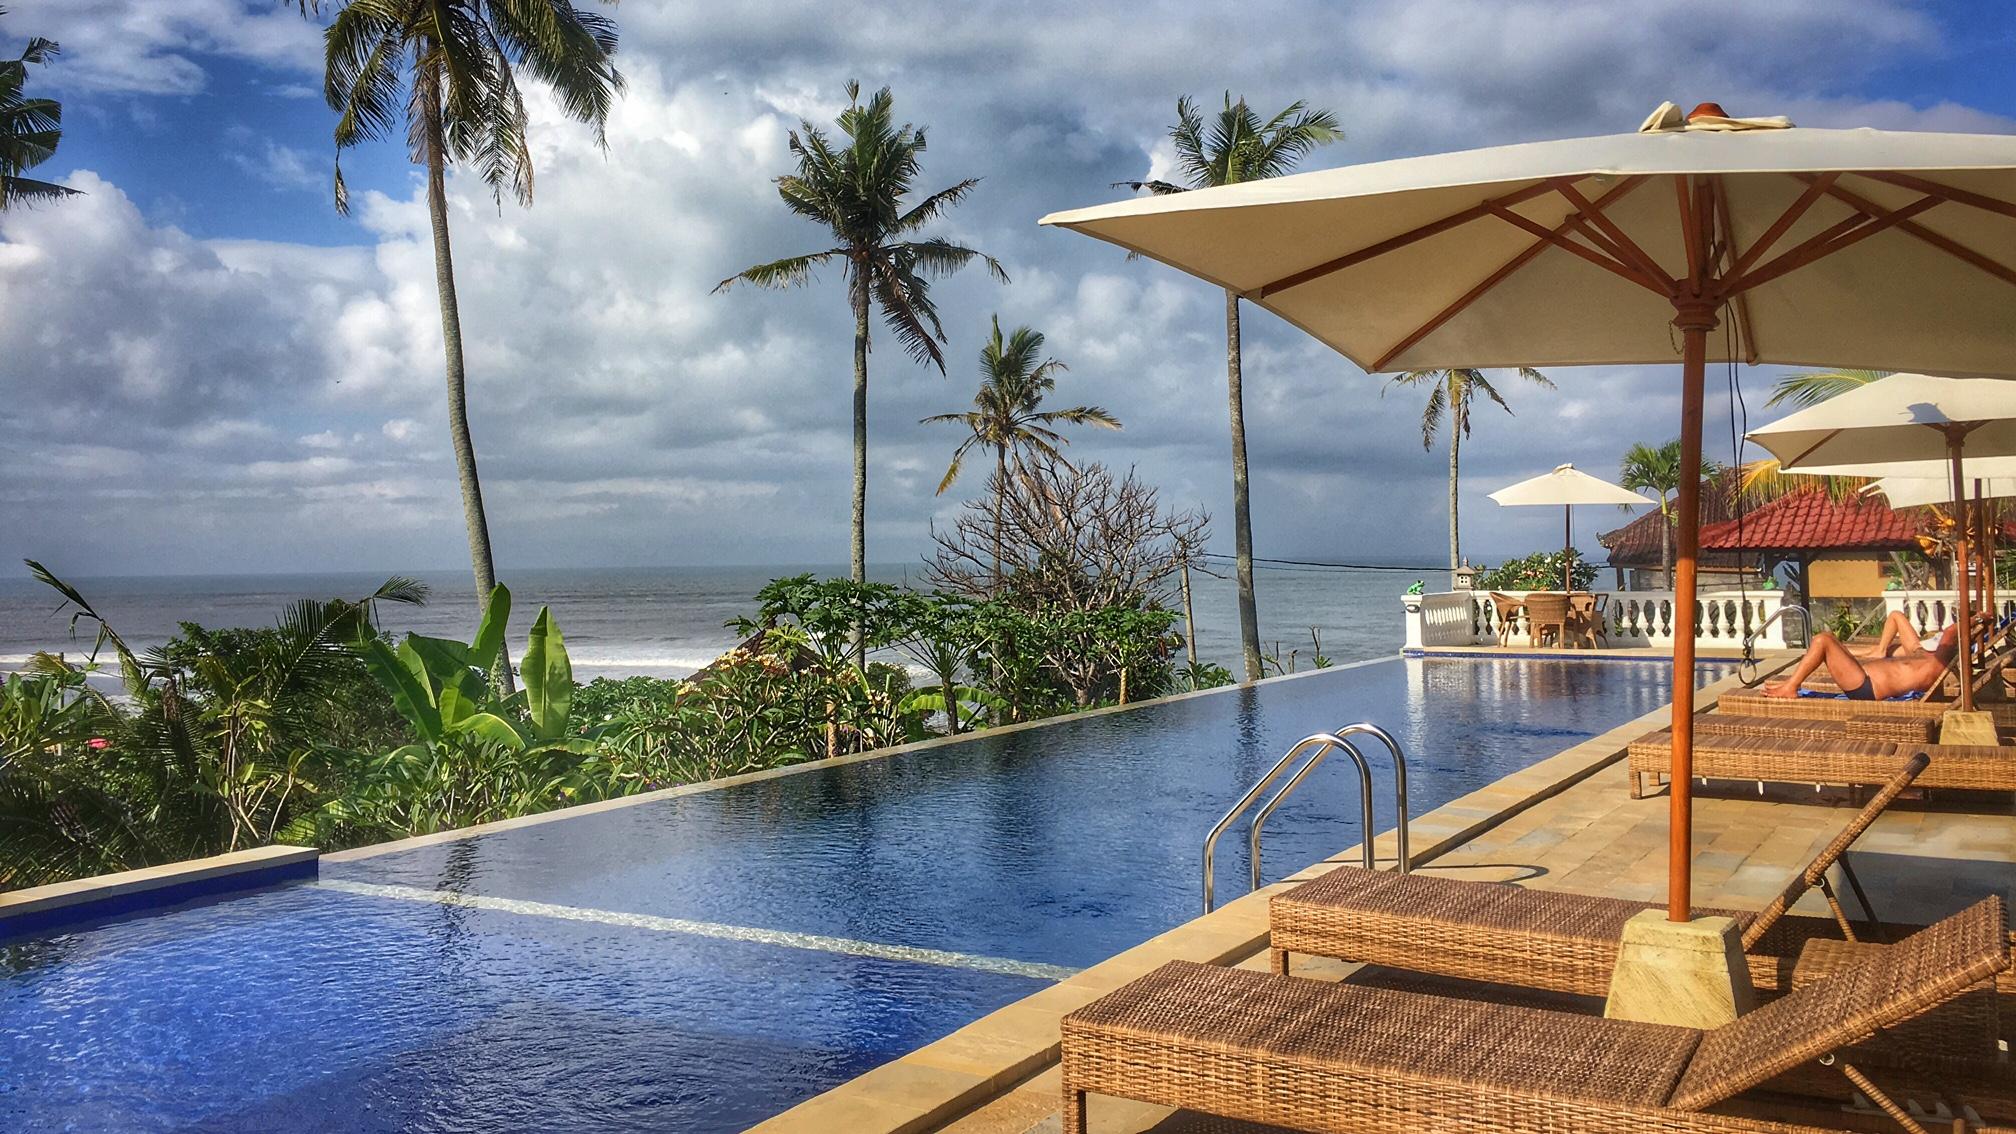 Gubug hotel in Balian